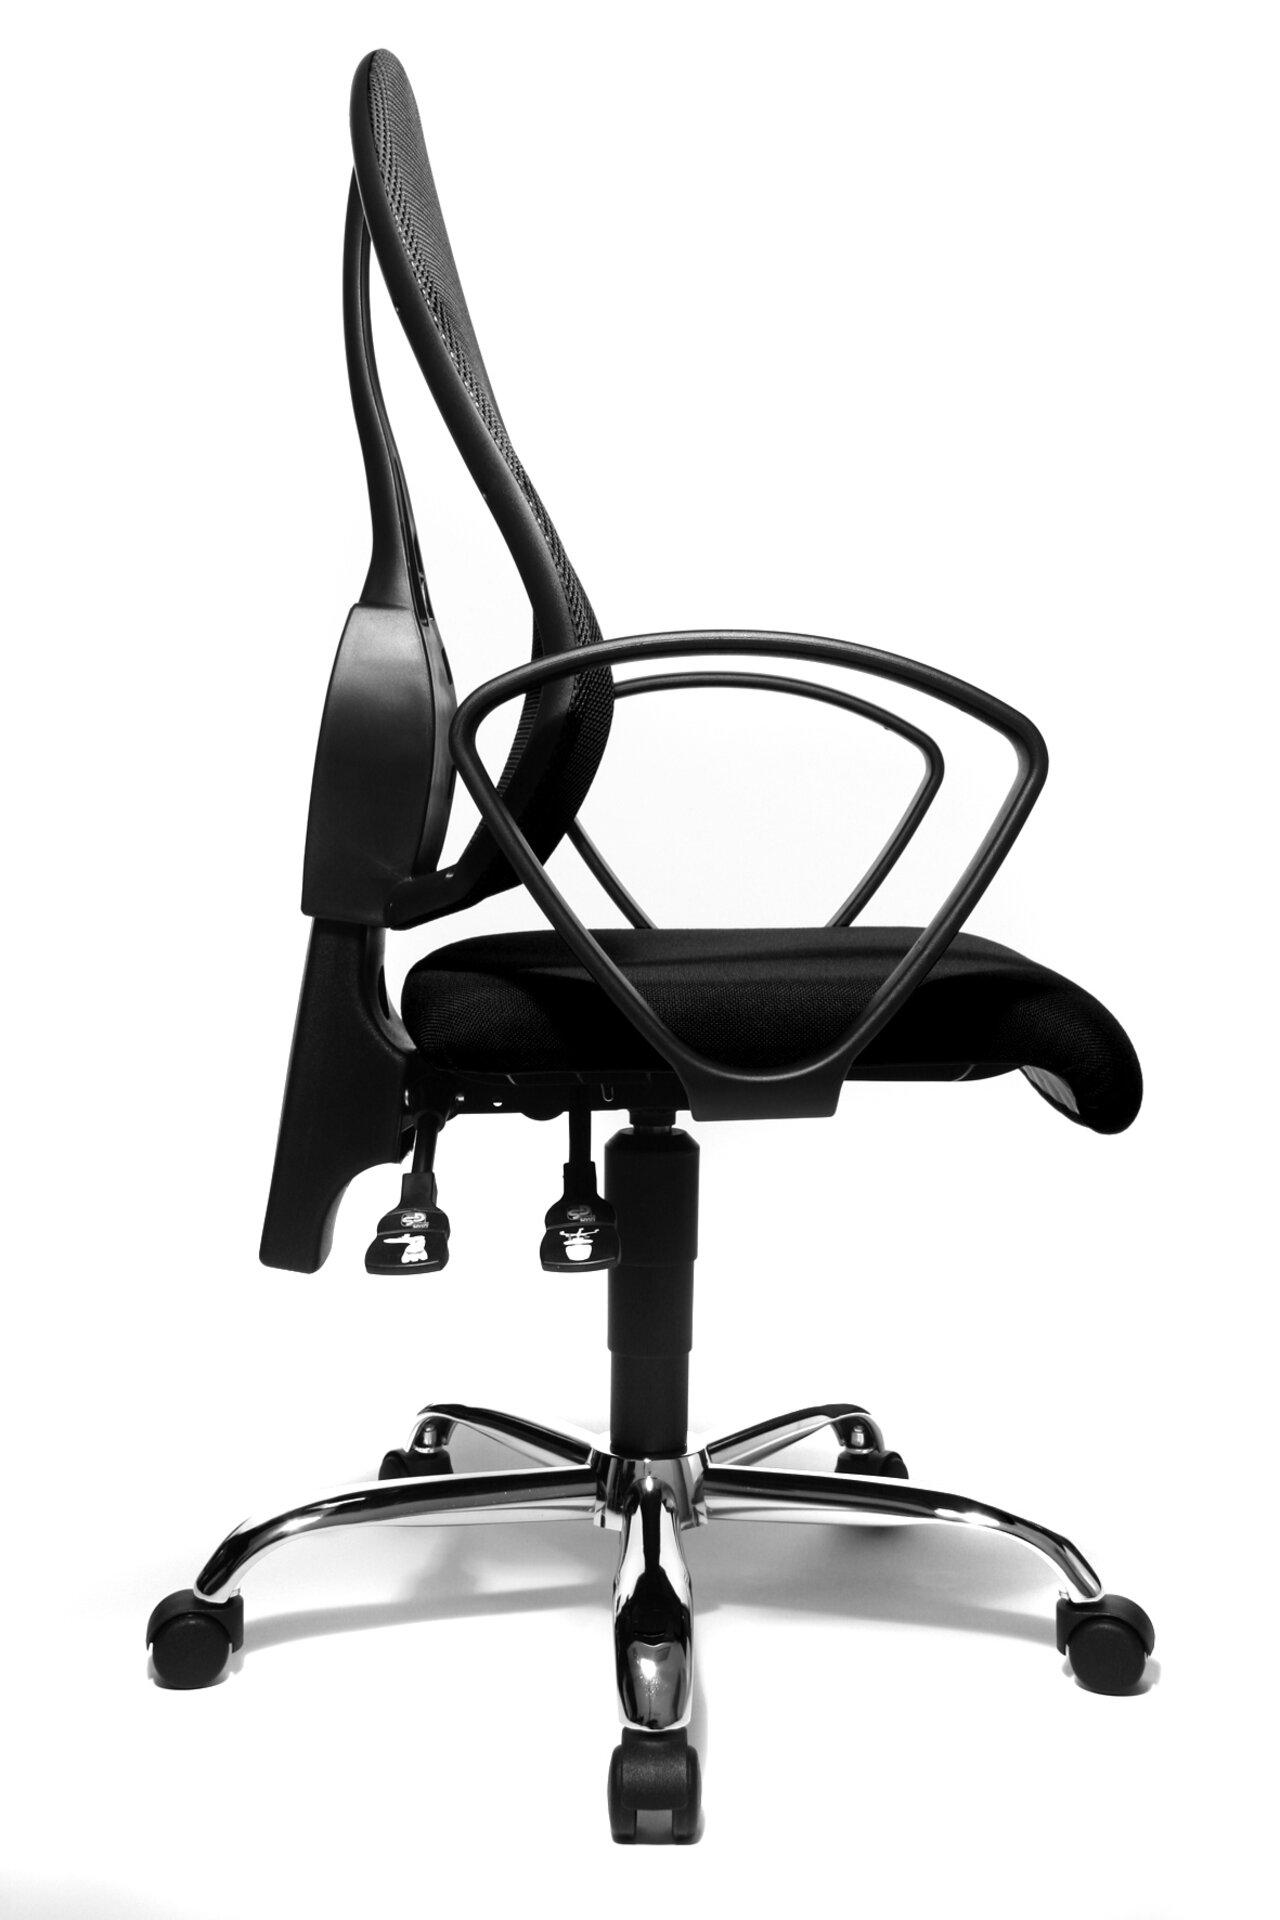 Büro-Drehstuhl OPEN POINT P SOMO Topstar Textil 40 x 110 x 40 cm